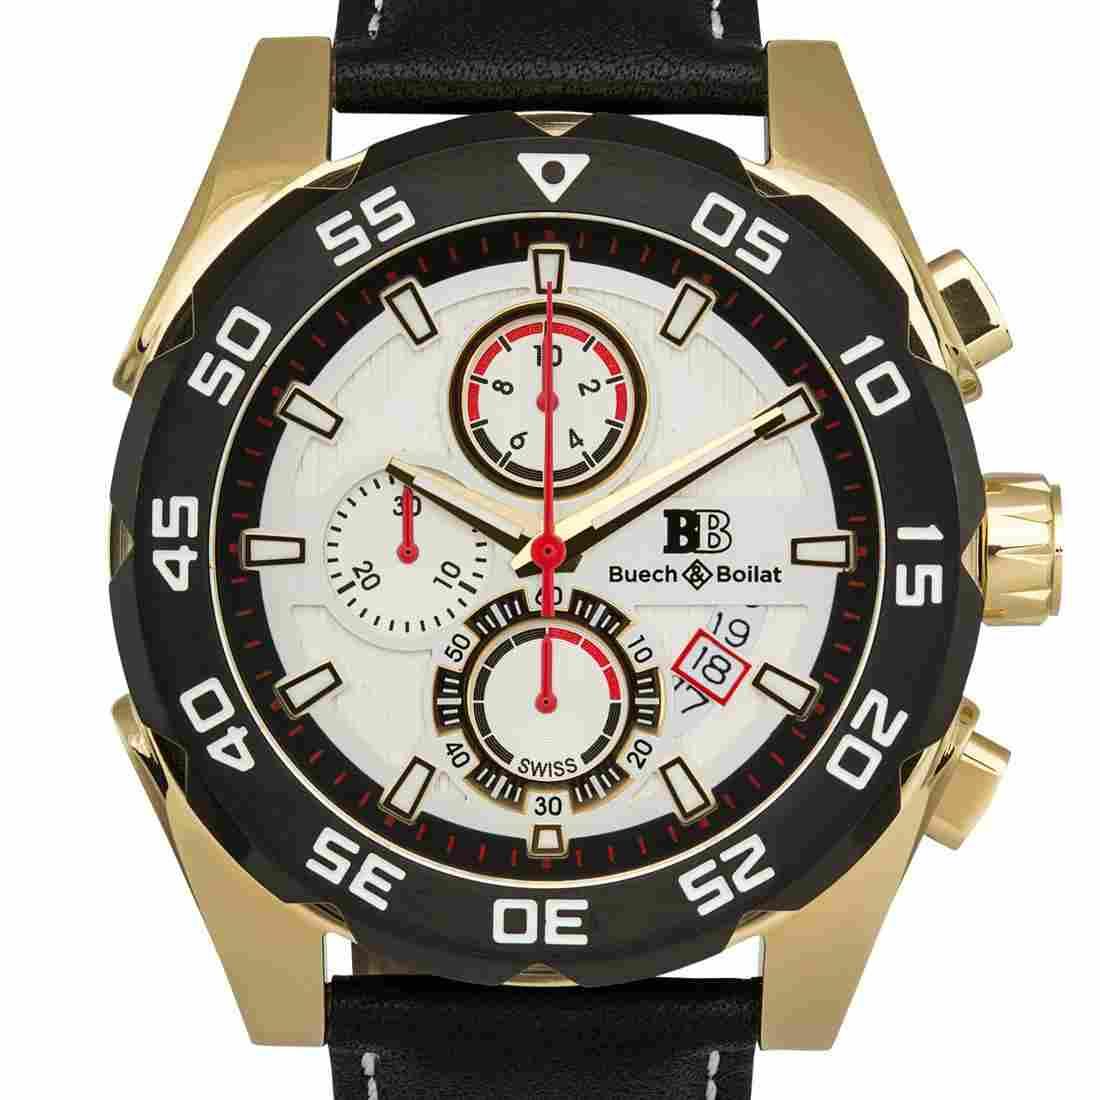 Buech & Boilat Torrent Mens Chronograph 44mm Case Watch